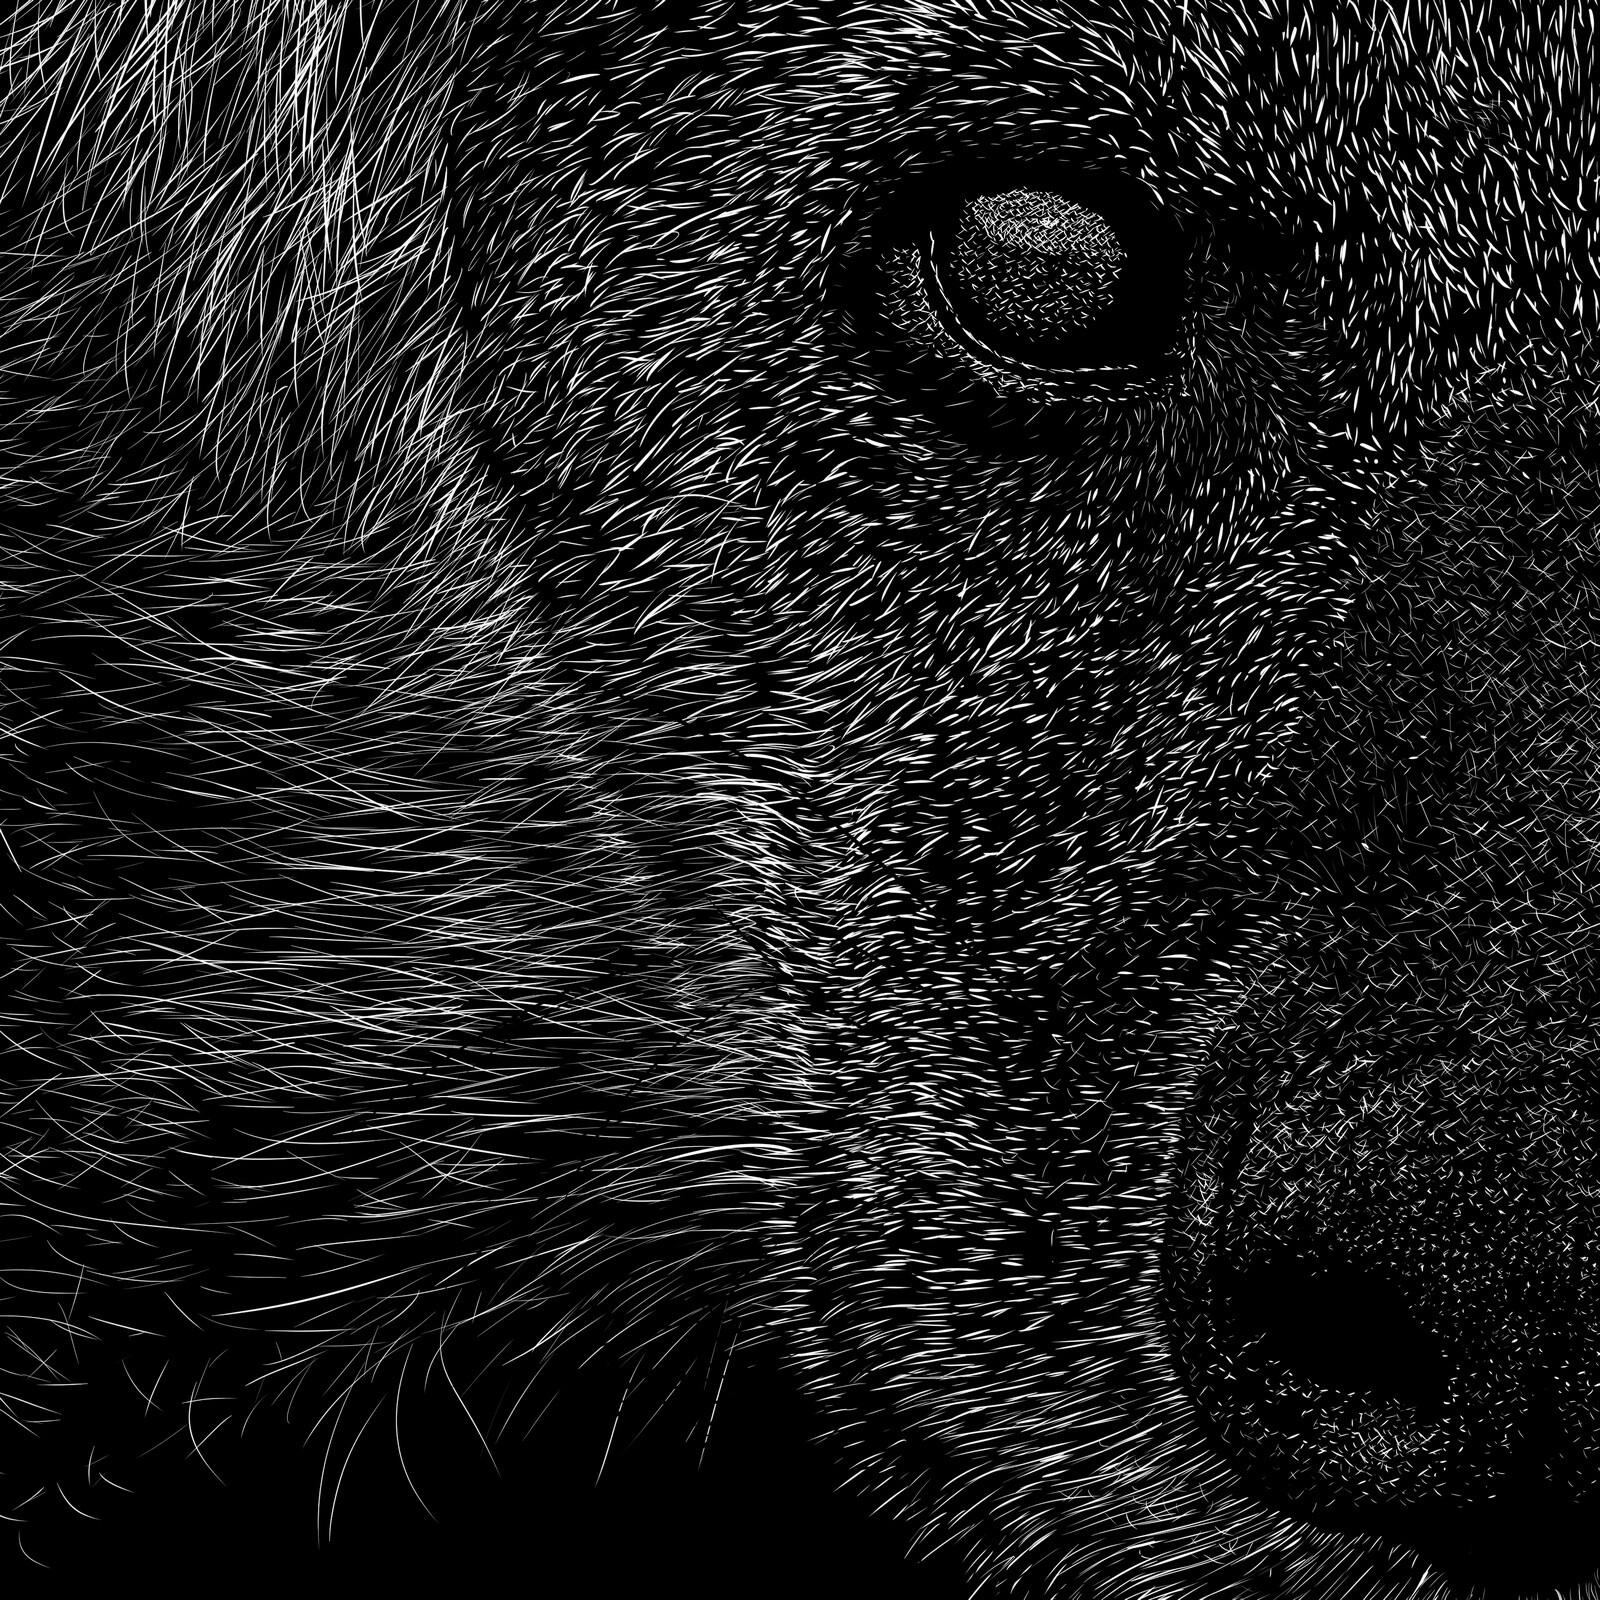 hyaenidae, eye-nose close-up Digital scratchboard, feb. 2019